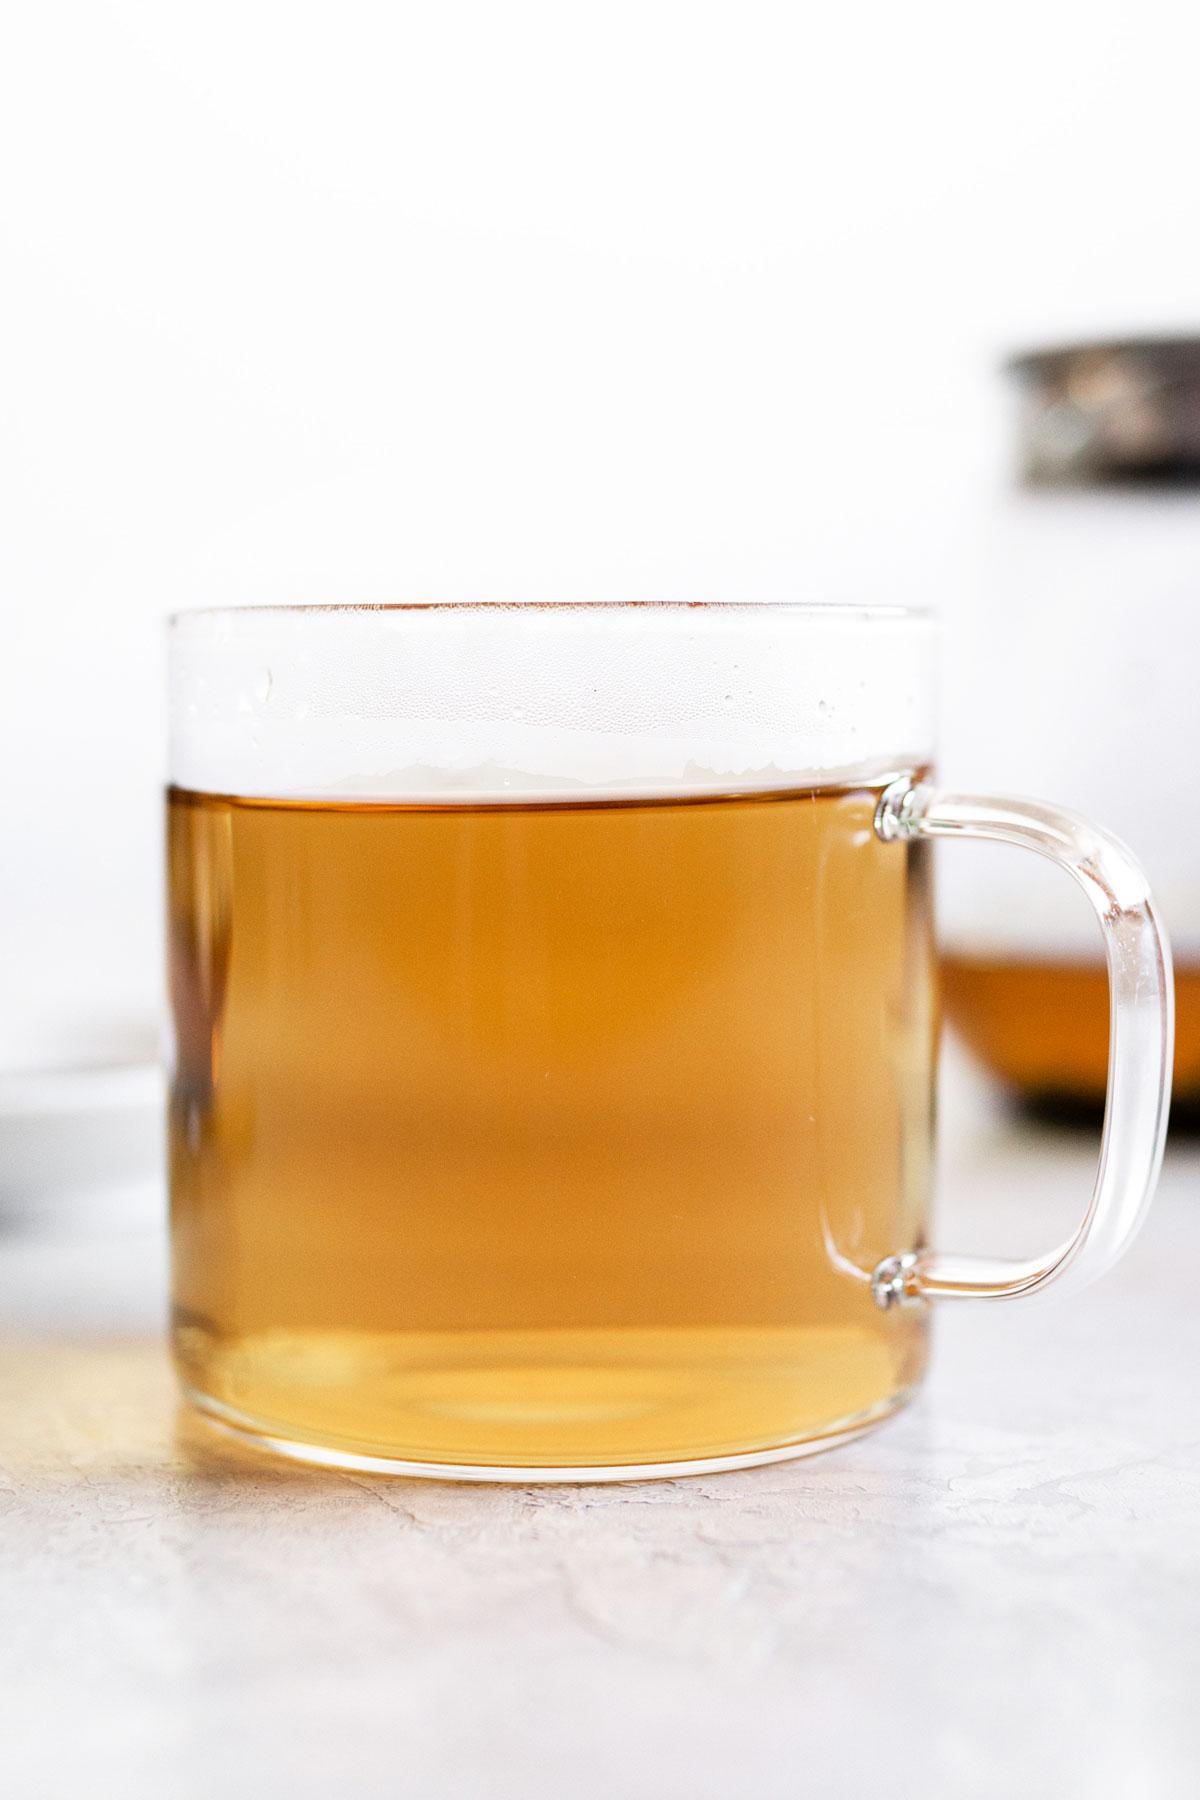 Peppermint tea in a glass mug.